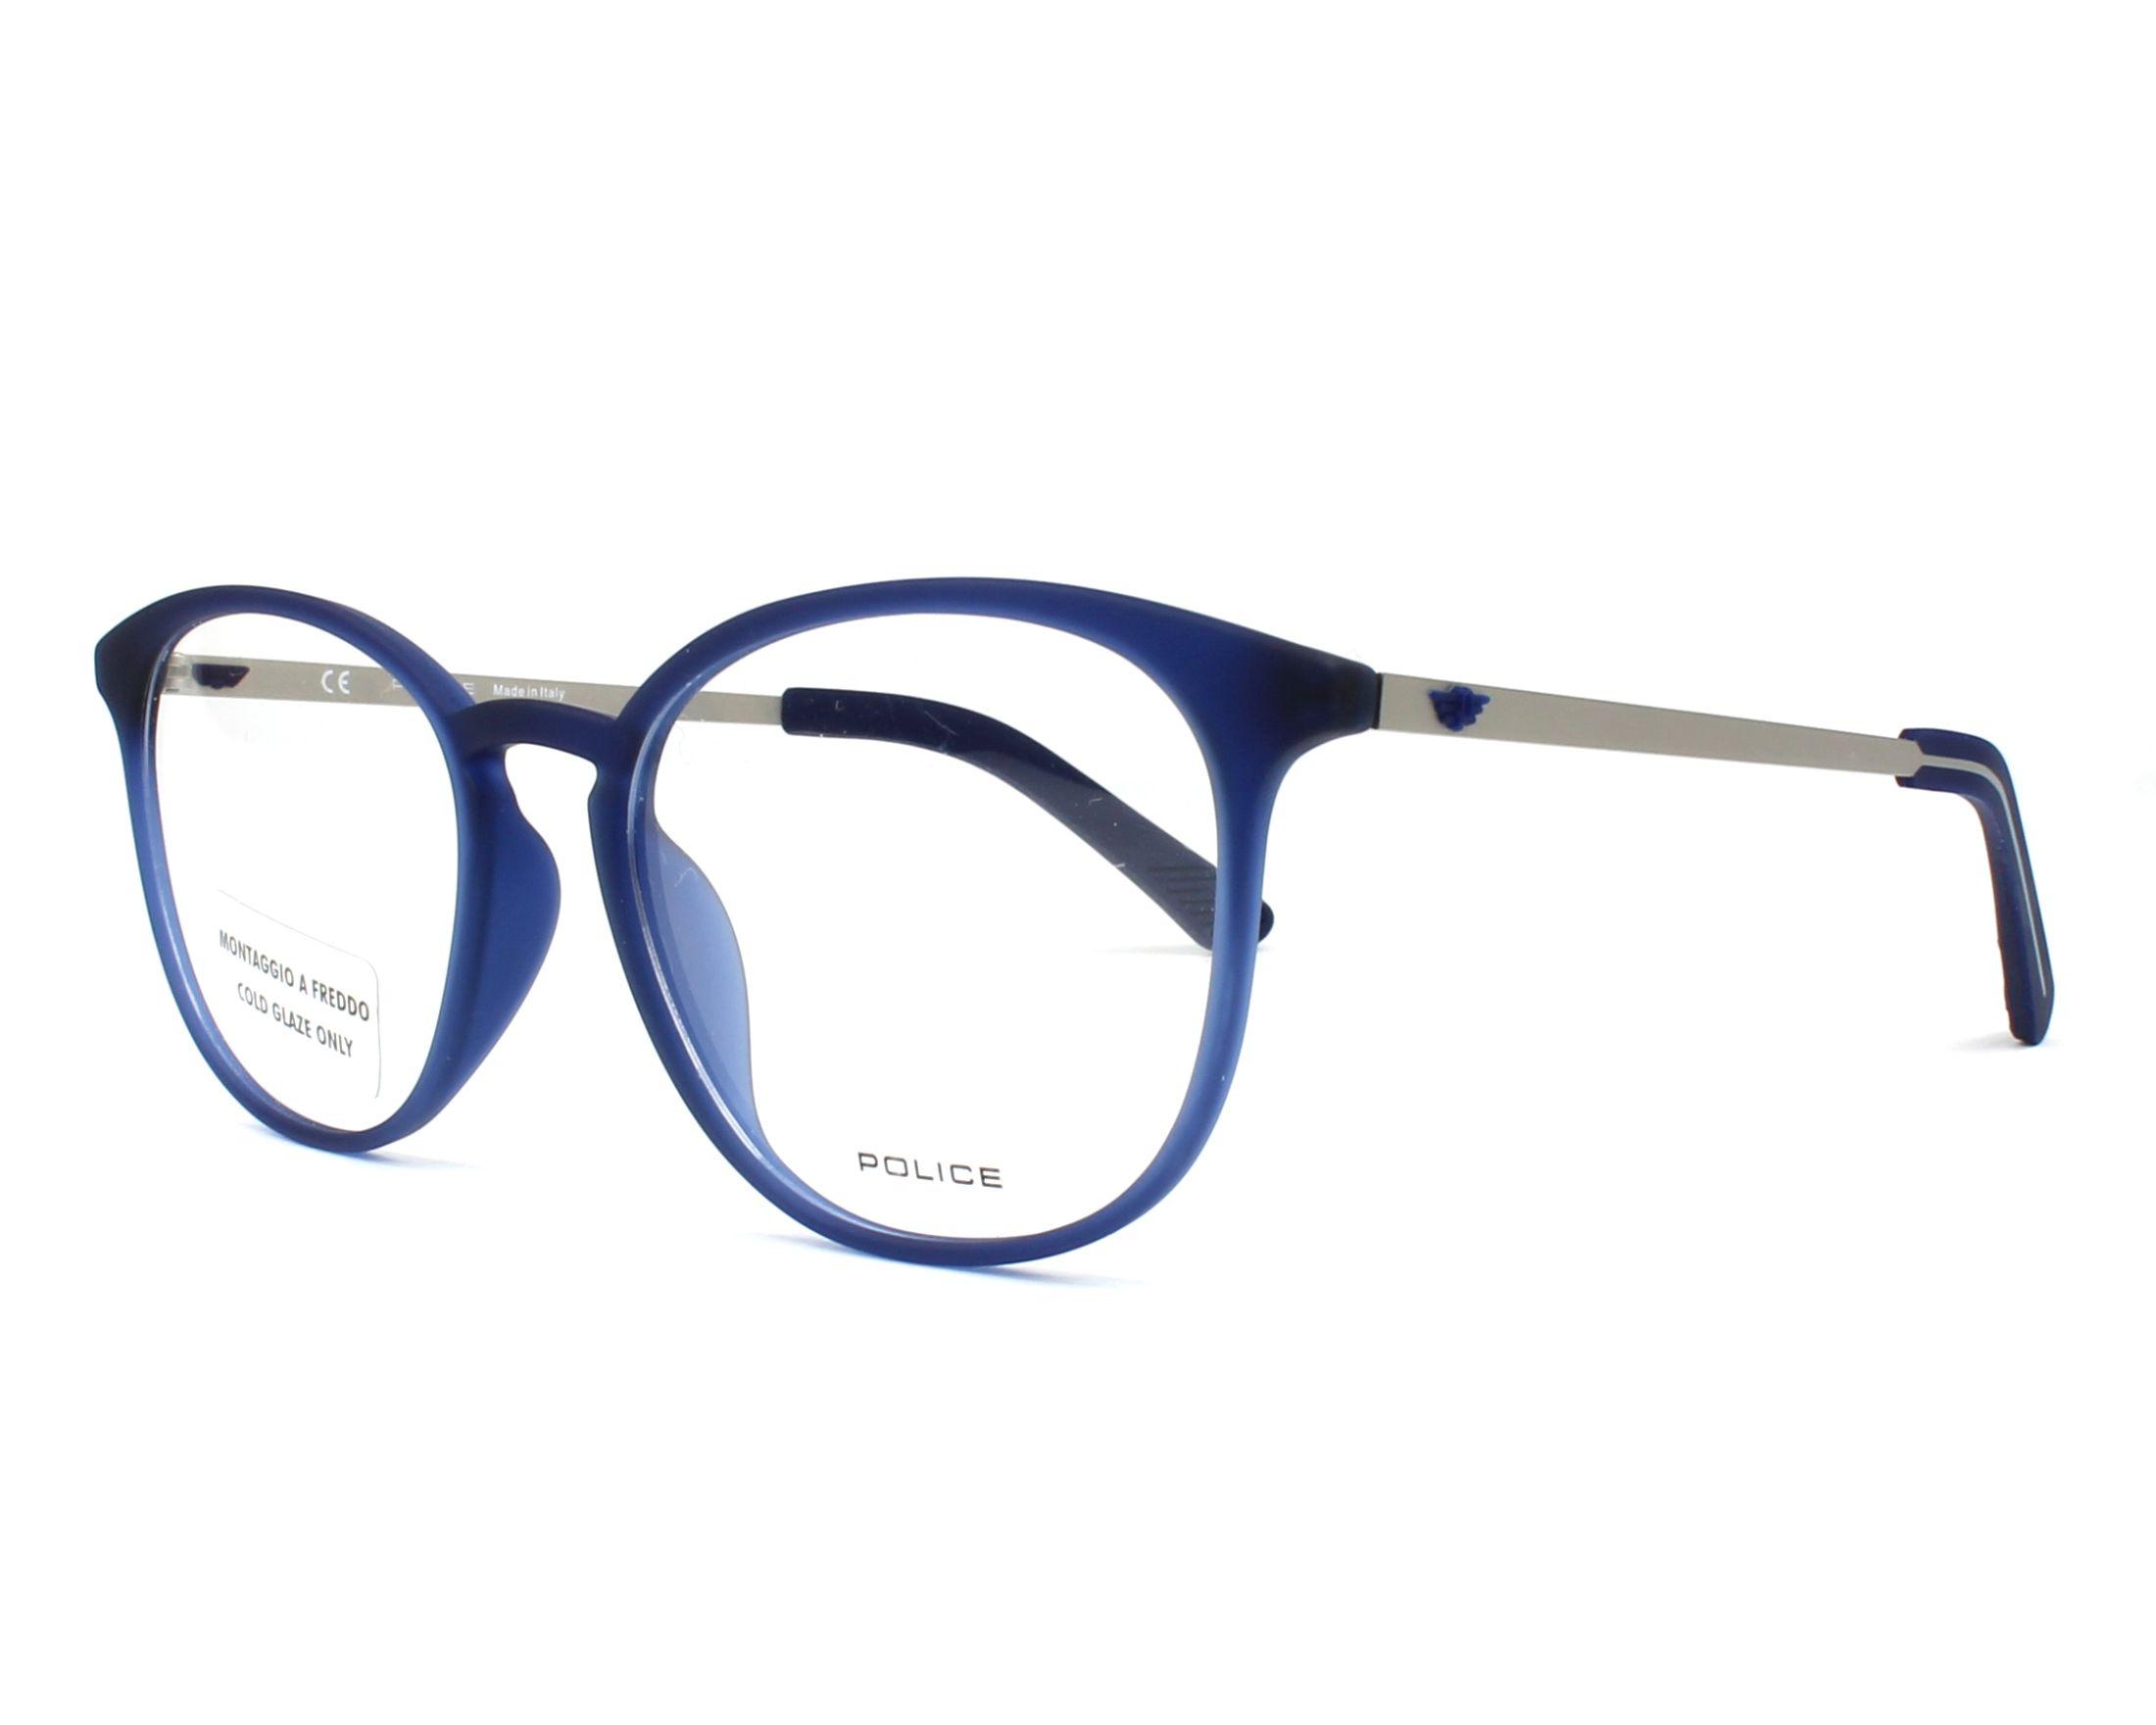 eyeglasses Police VPL-554 092E 51-18 Blue Gun profile view b14fee121f29